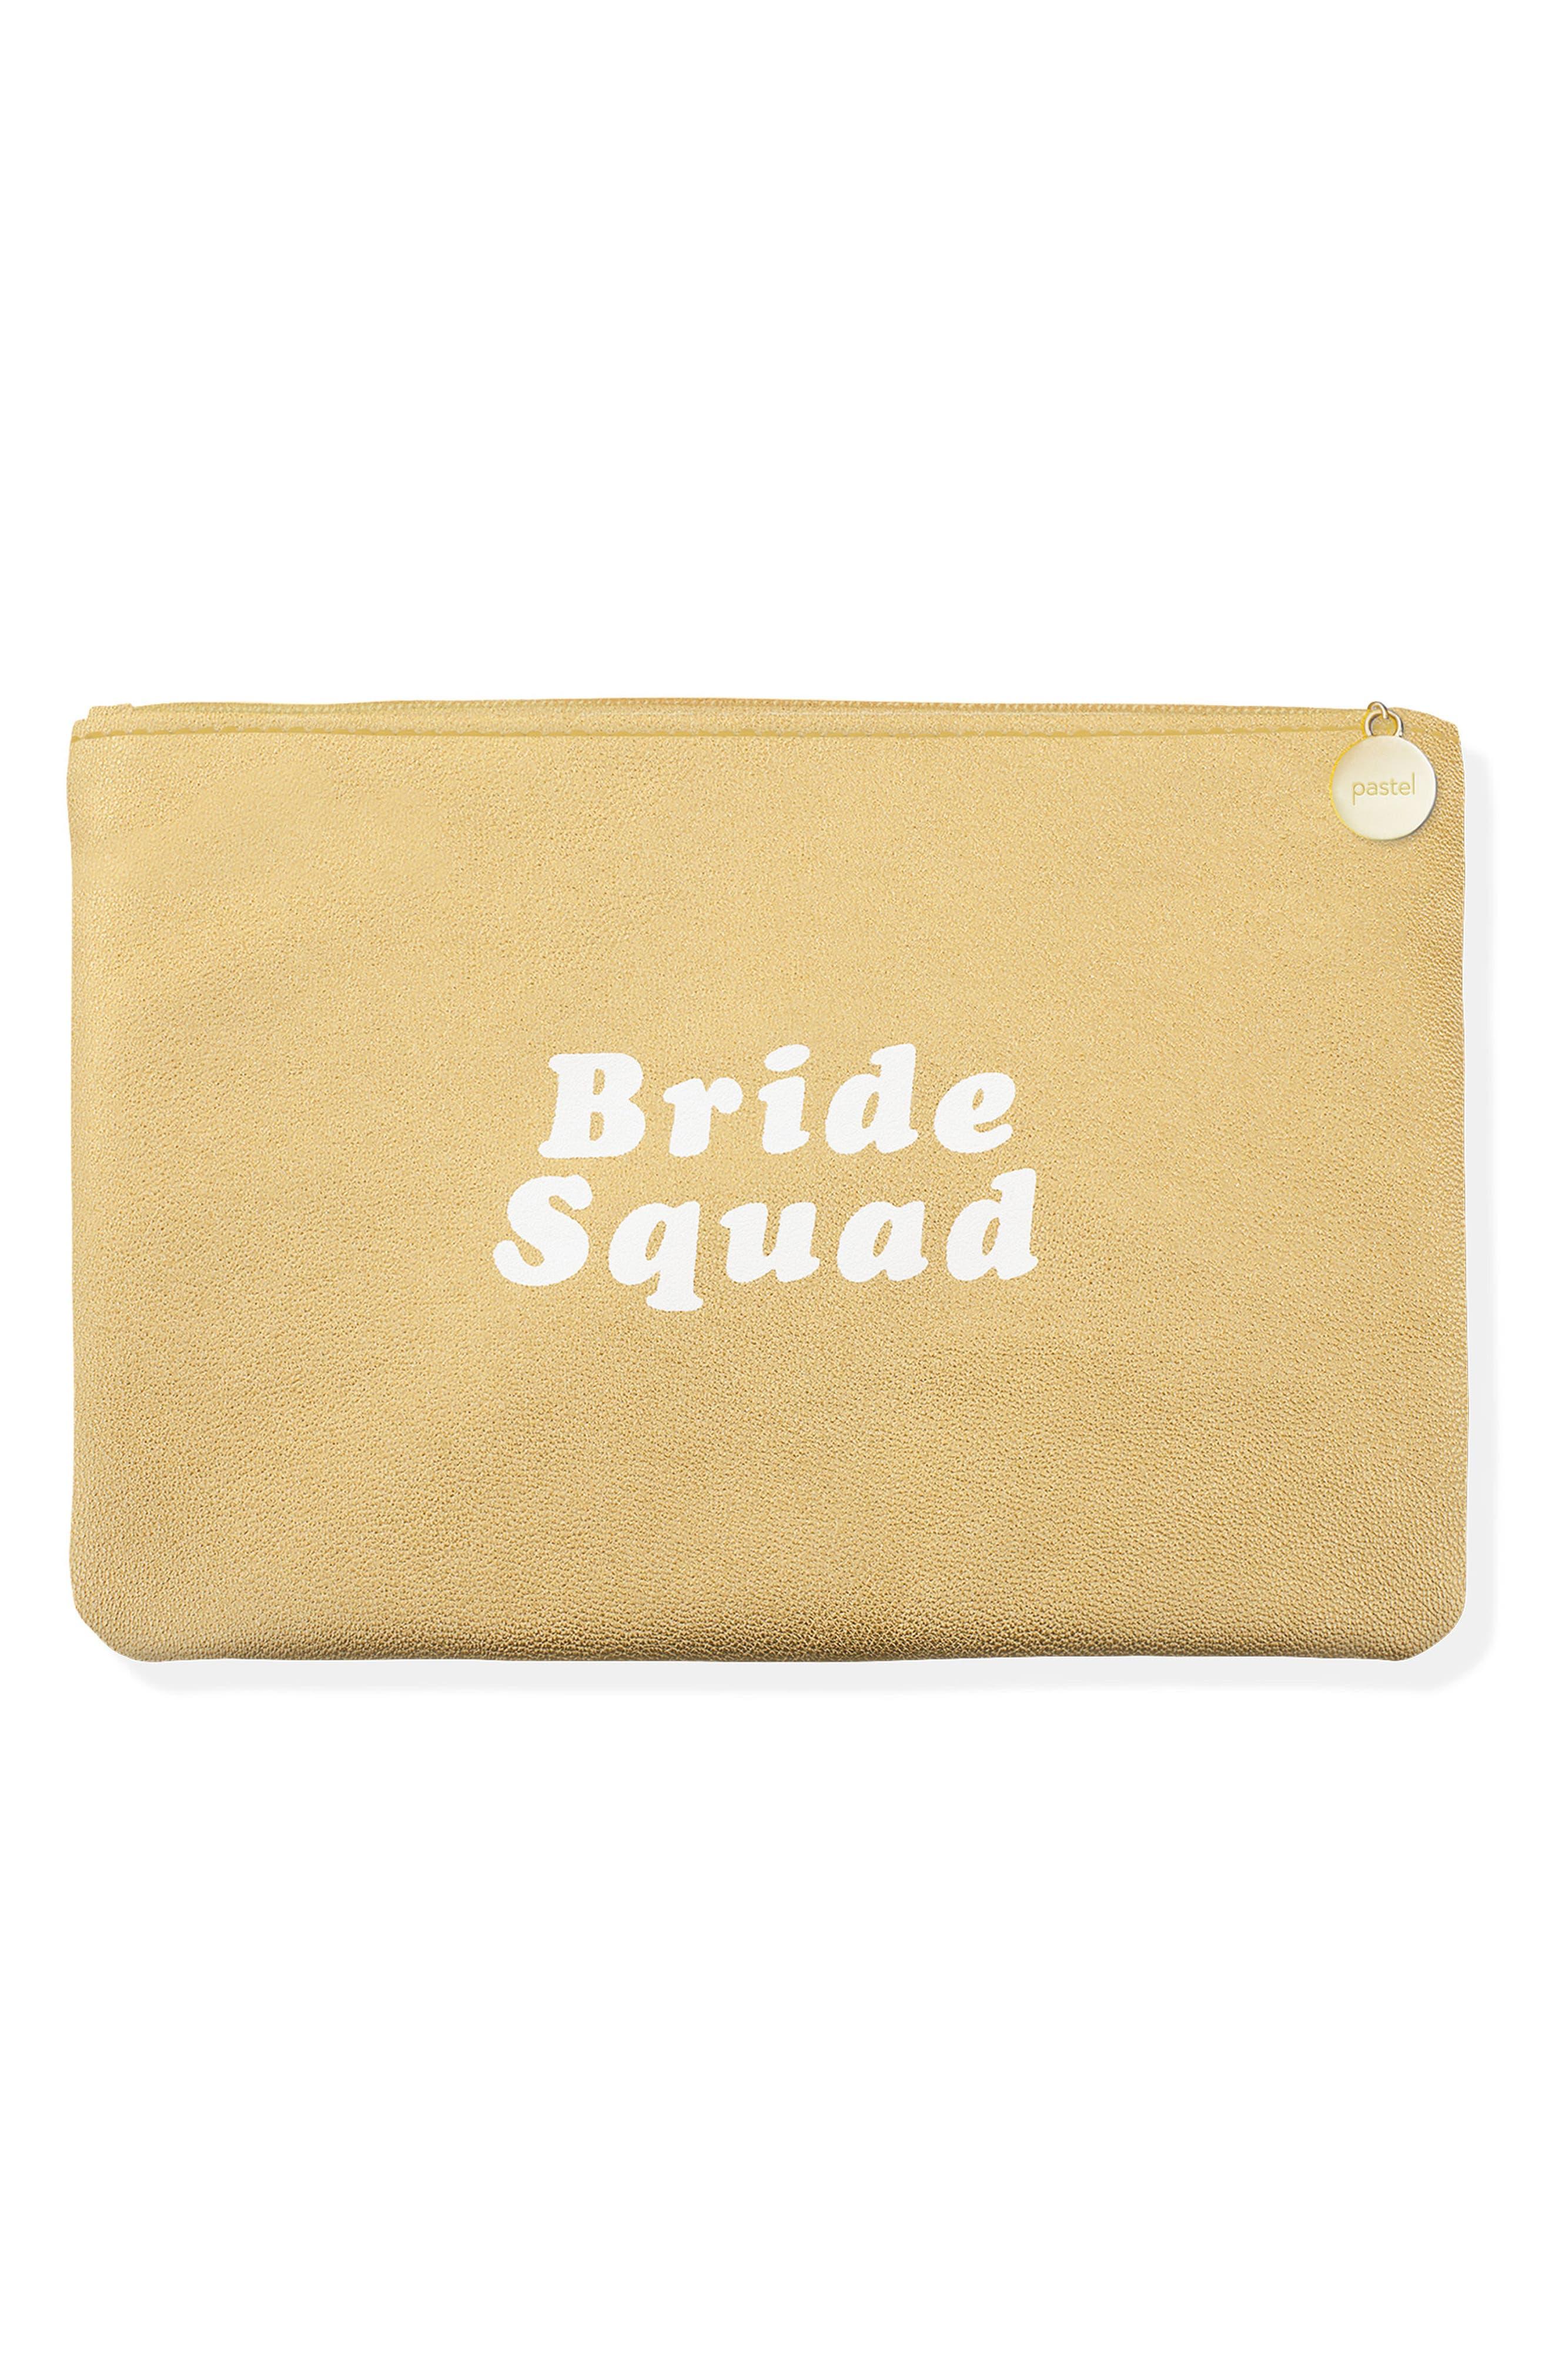 Alternate Image 1 Selected - Fringe Studio Bride Squad Zip Pouch